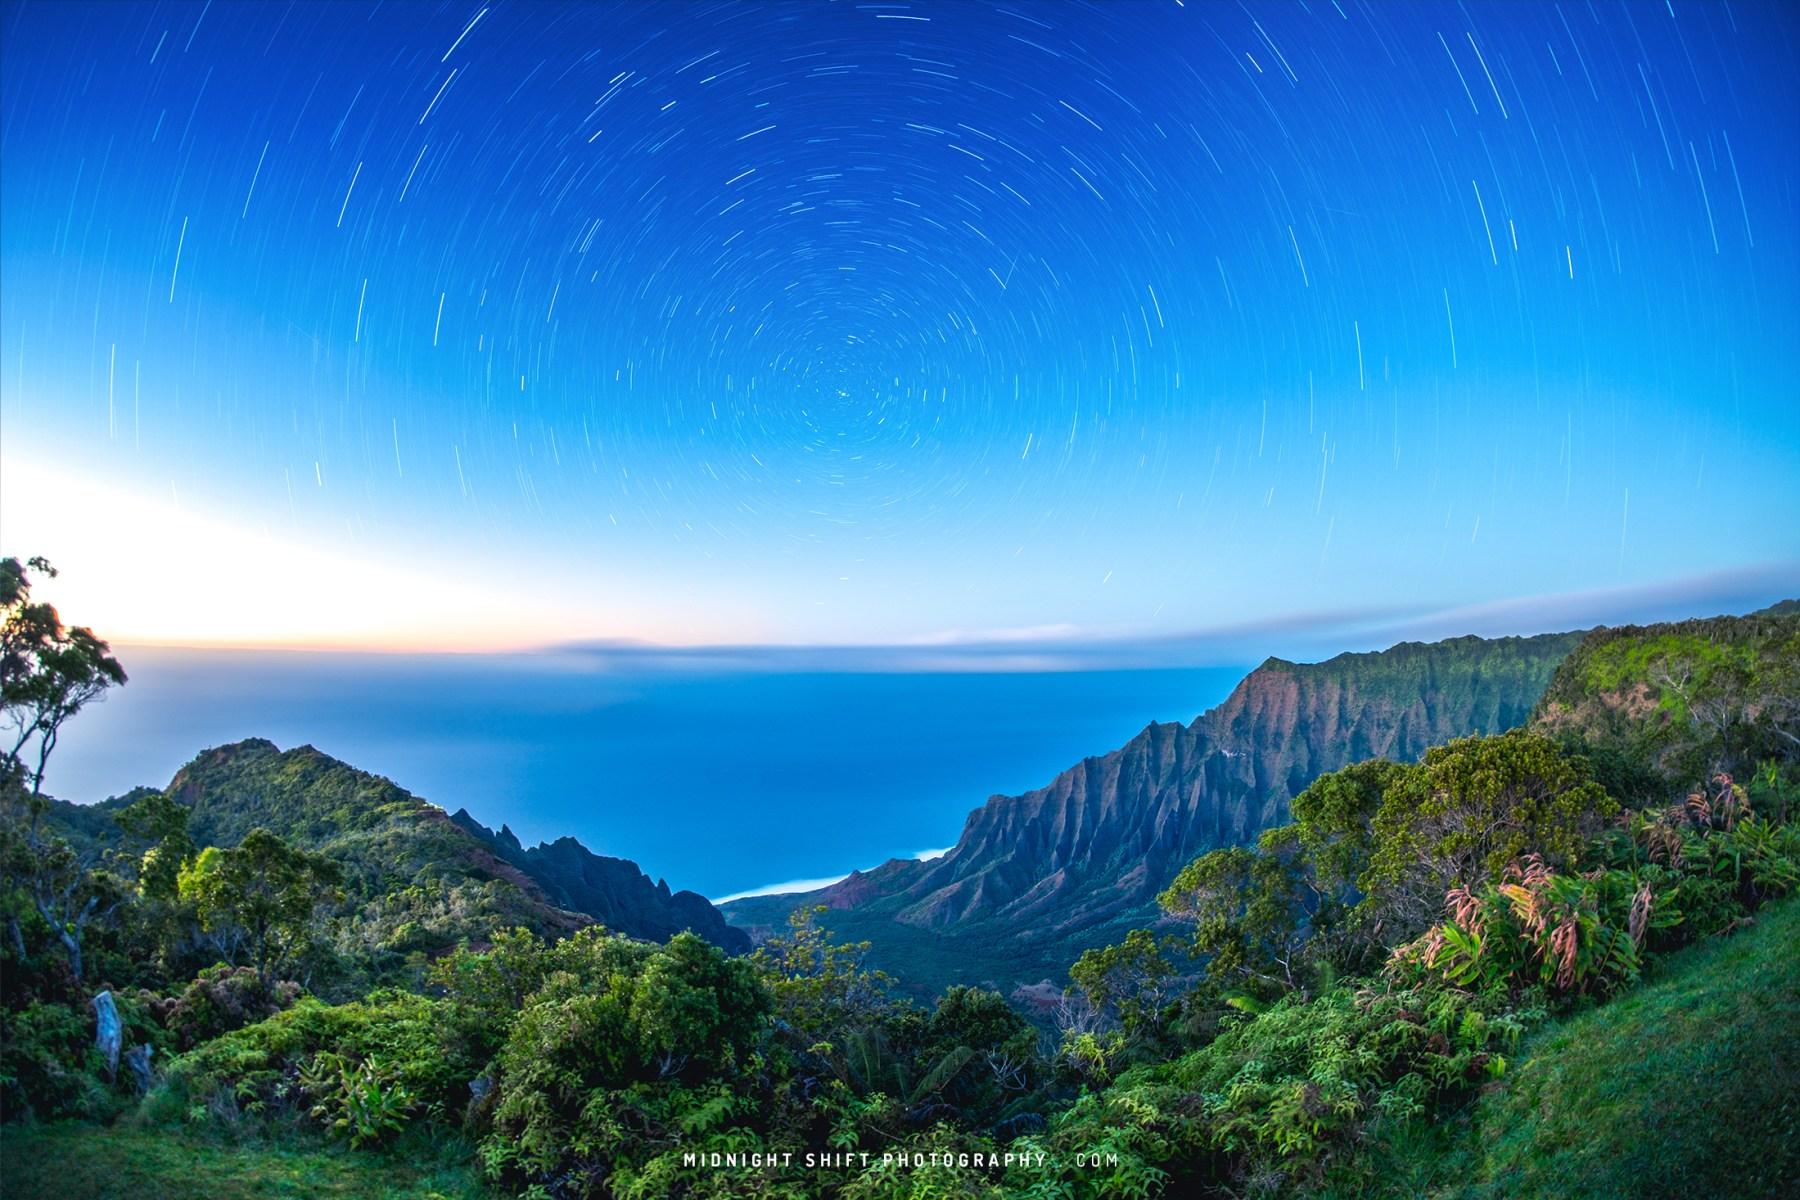 Star Trails over Kalalau Lookout on the island of Kauai, Hawaii.